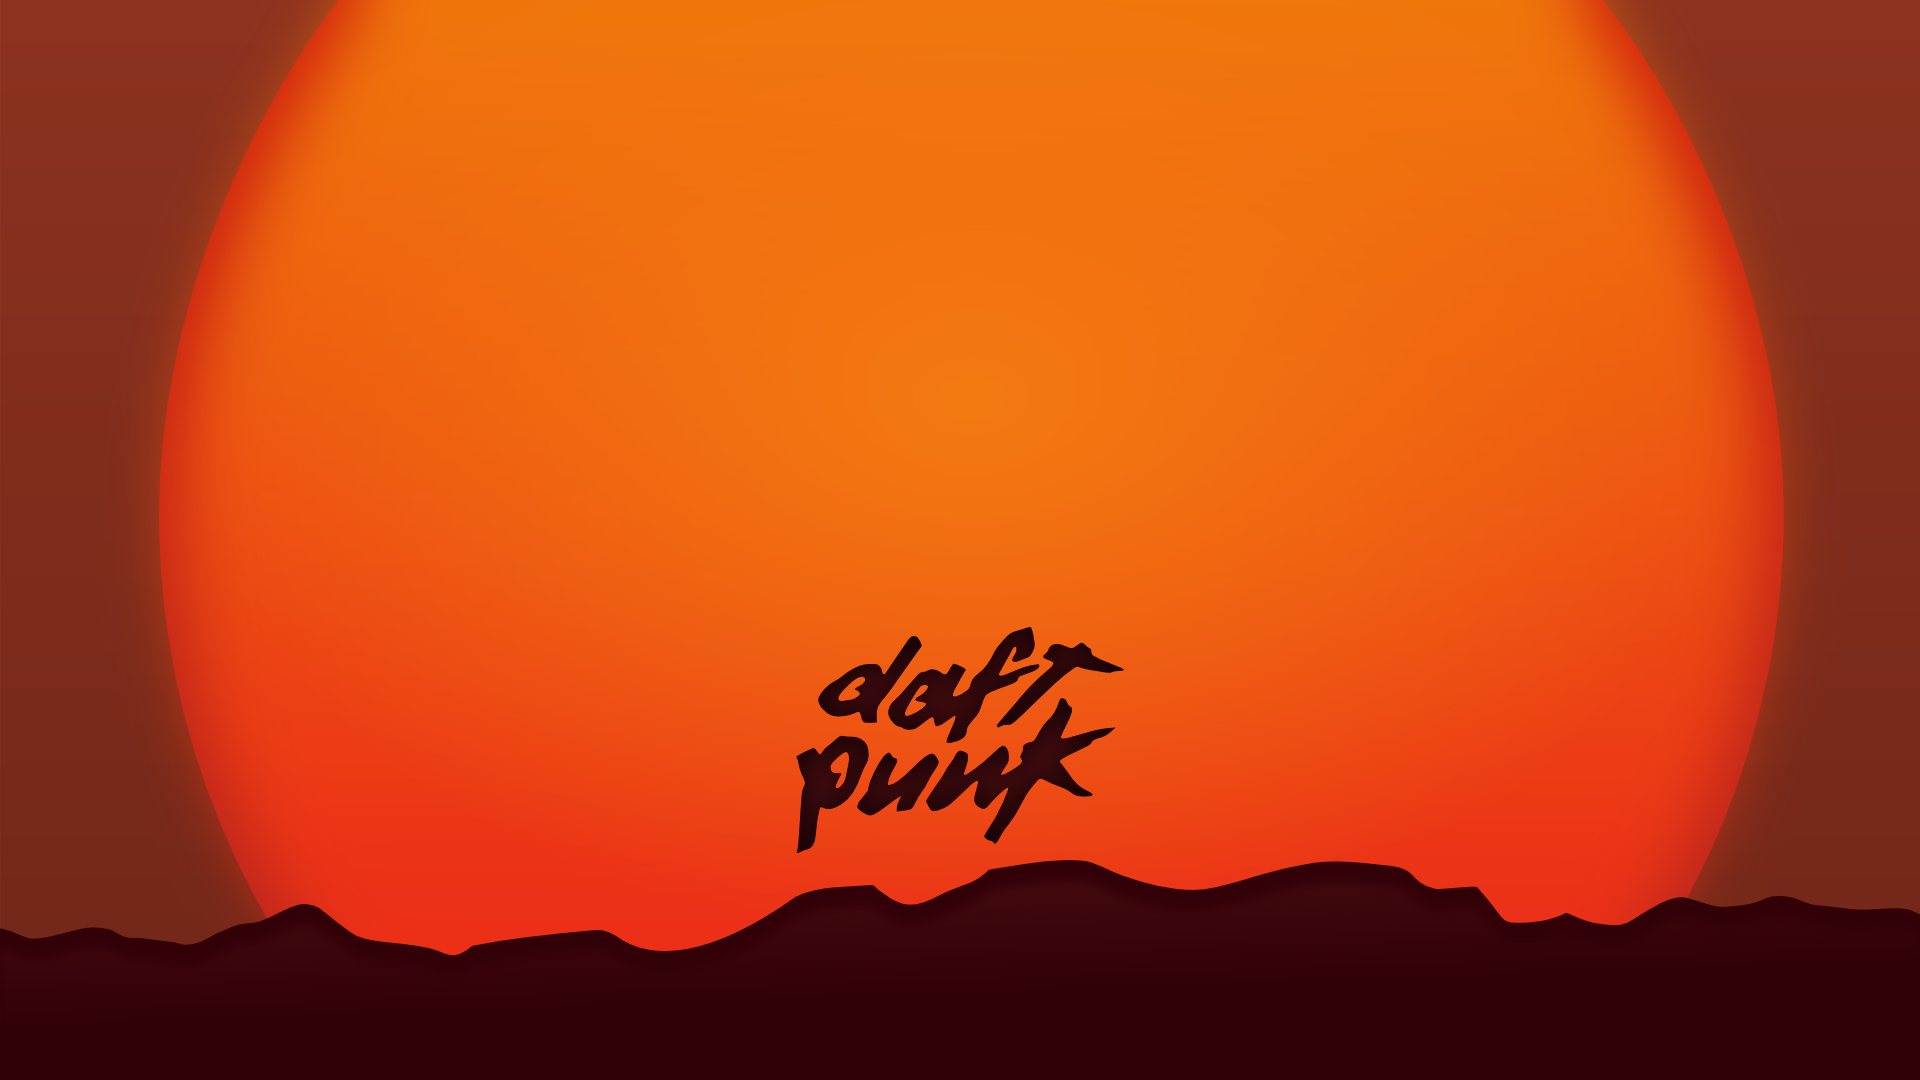 Daft Punk - Get Lucky (sunrise scene) by kartine29 on DeviantArt